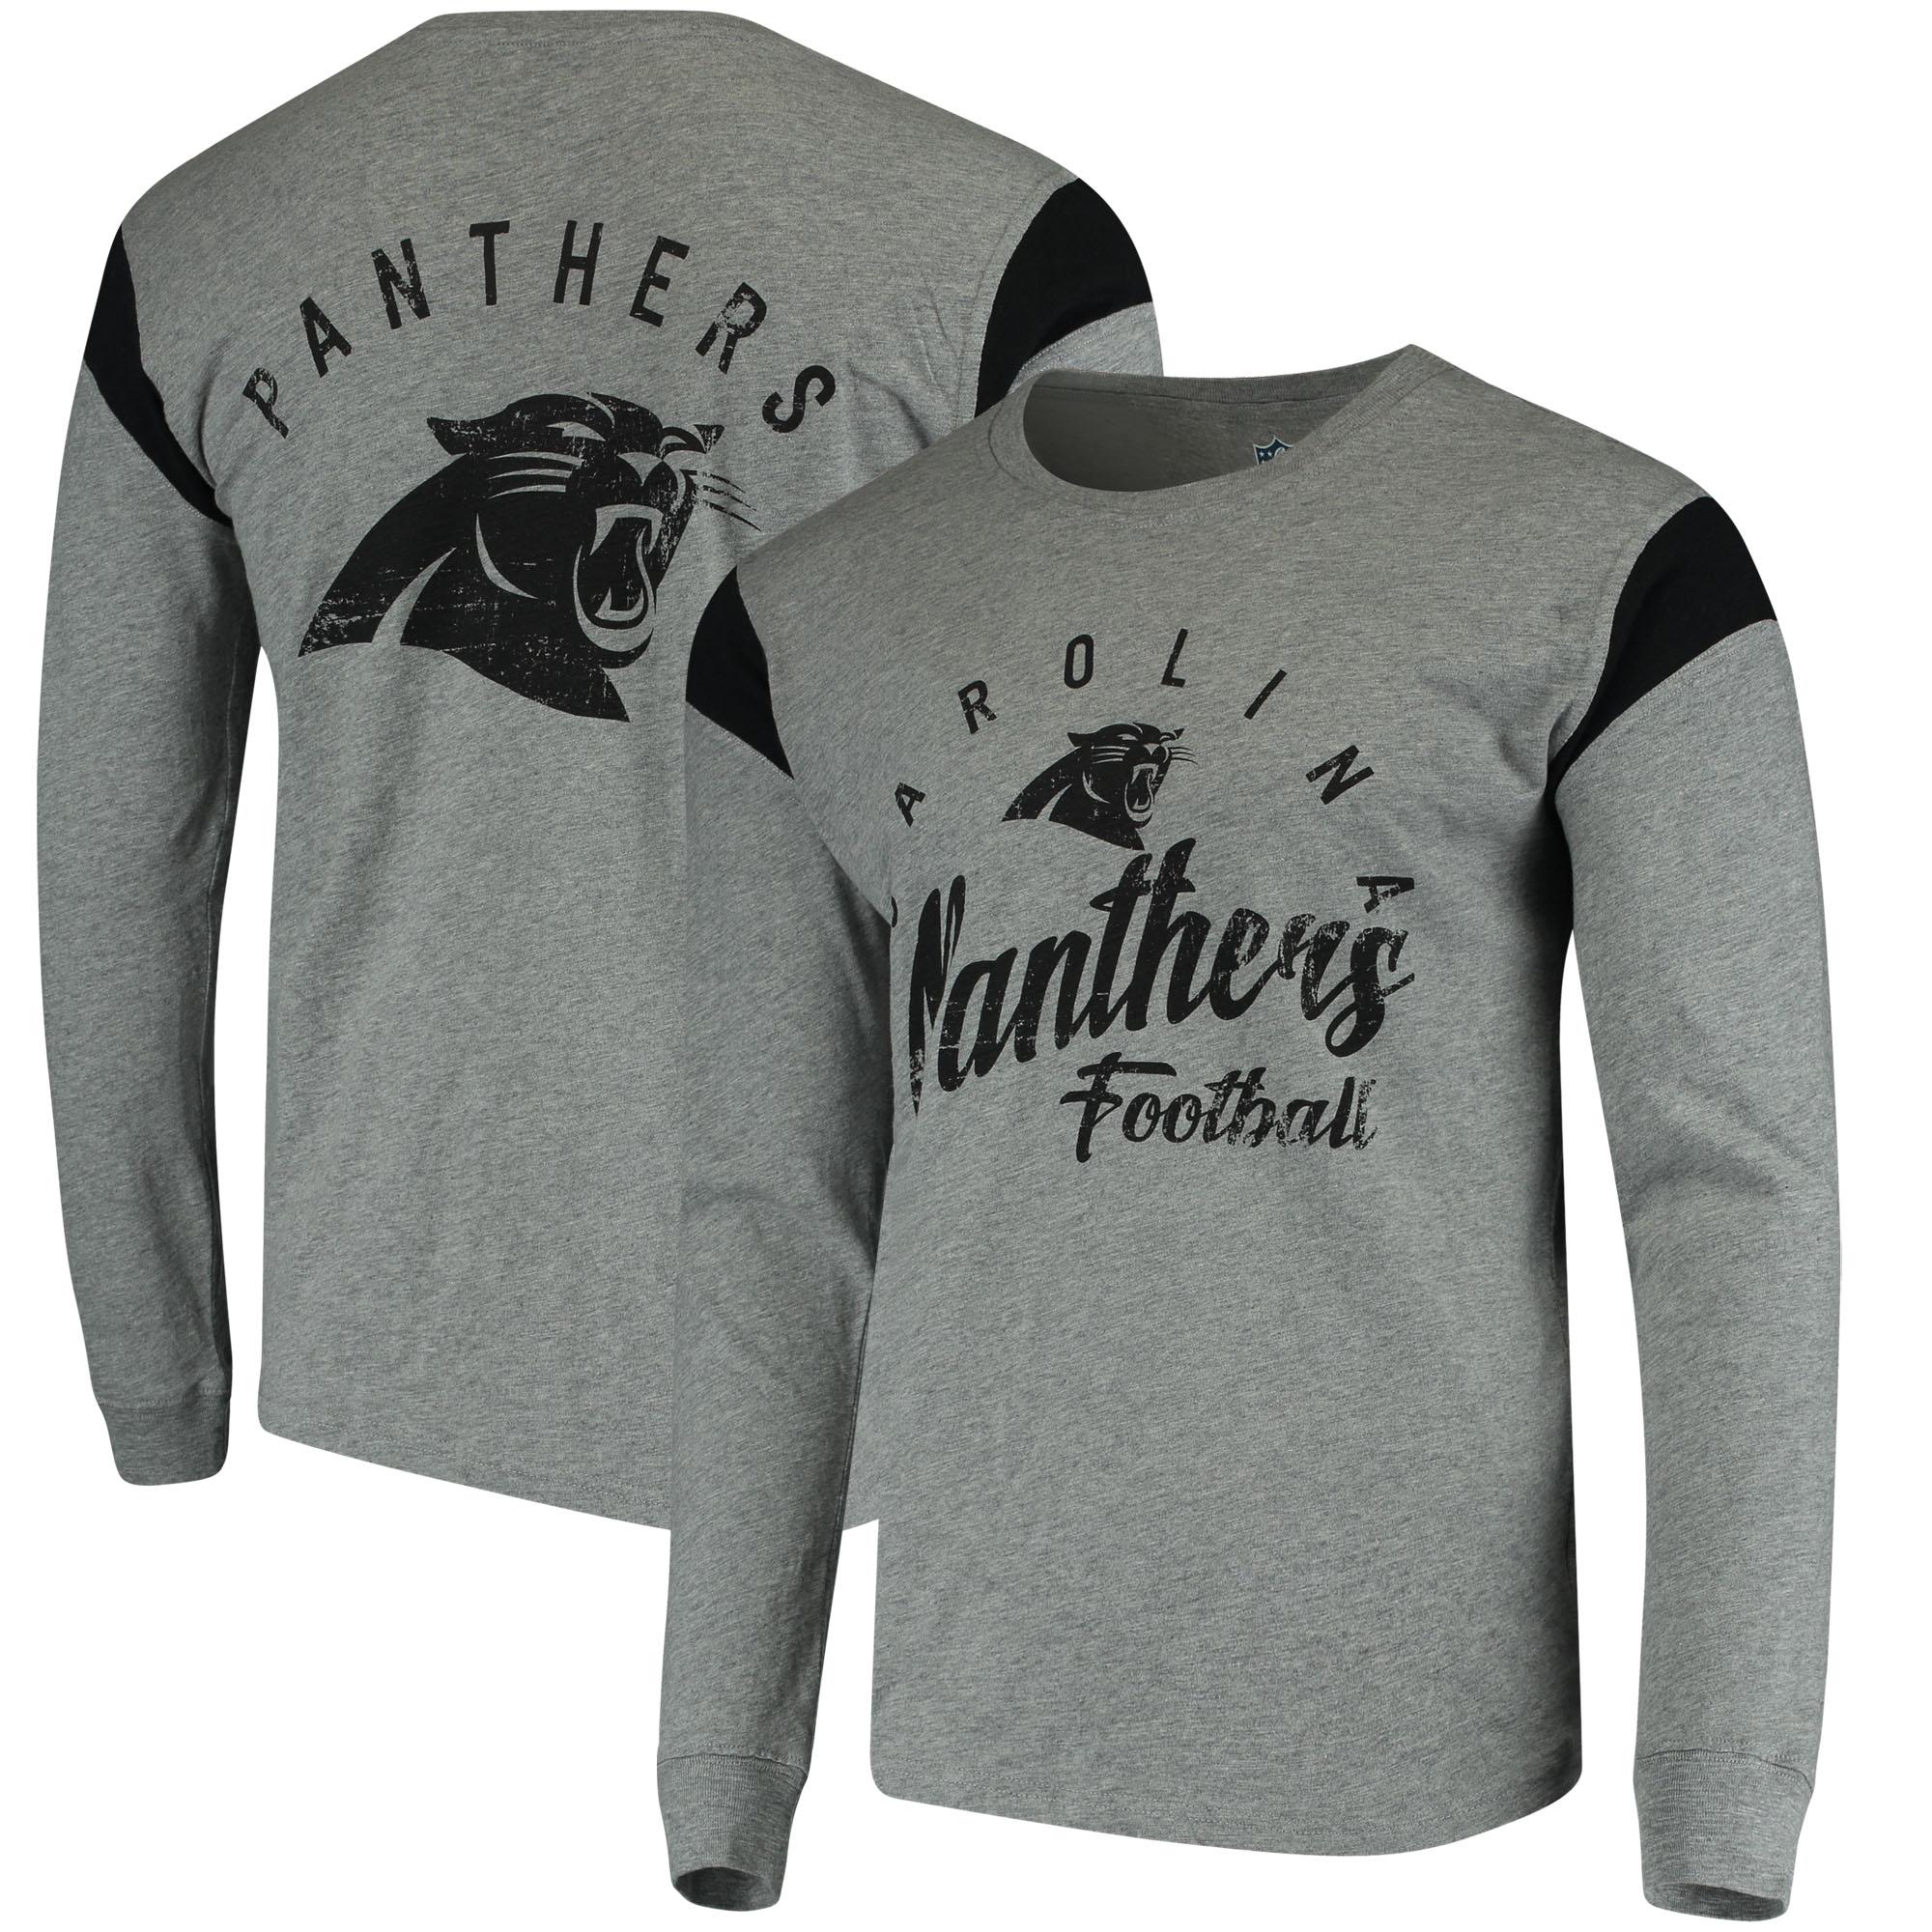 Carolina Panthers Hands High Receiver Long Sleeve T-Shirt - Gray/Black